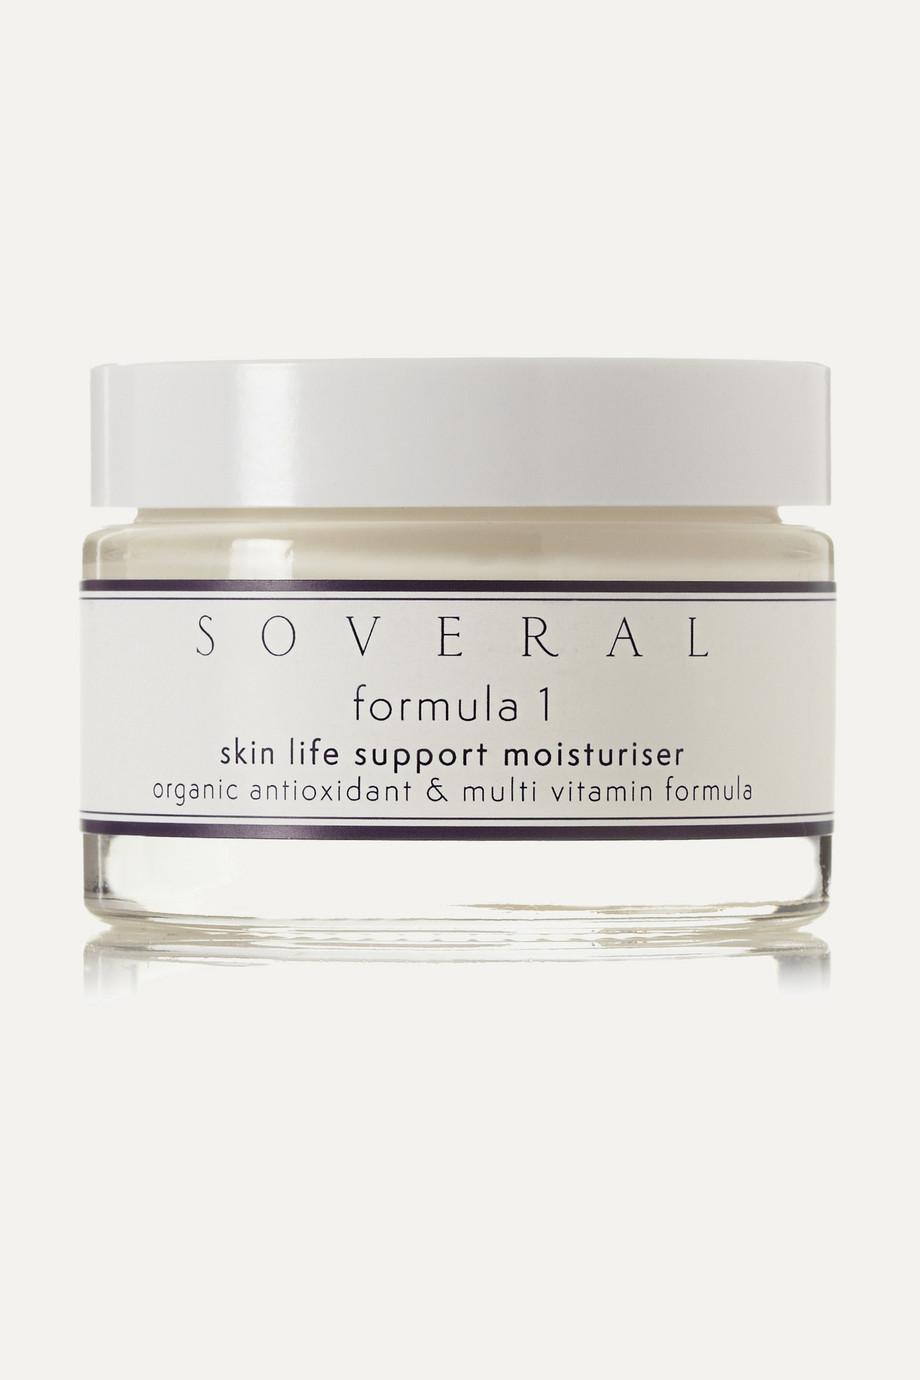 SOVERAL Formula 1 Skin Life Support Moisturizer, 50ml